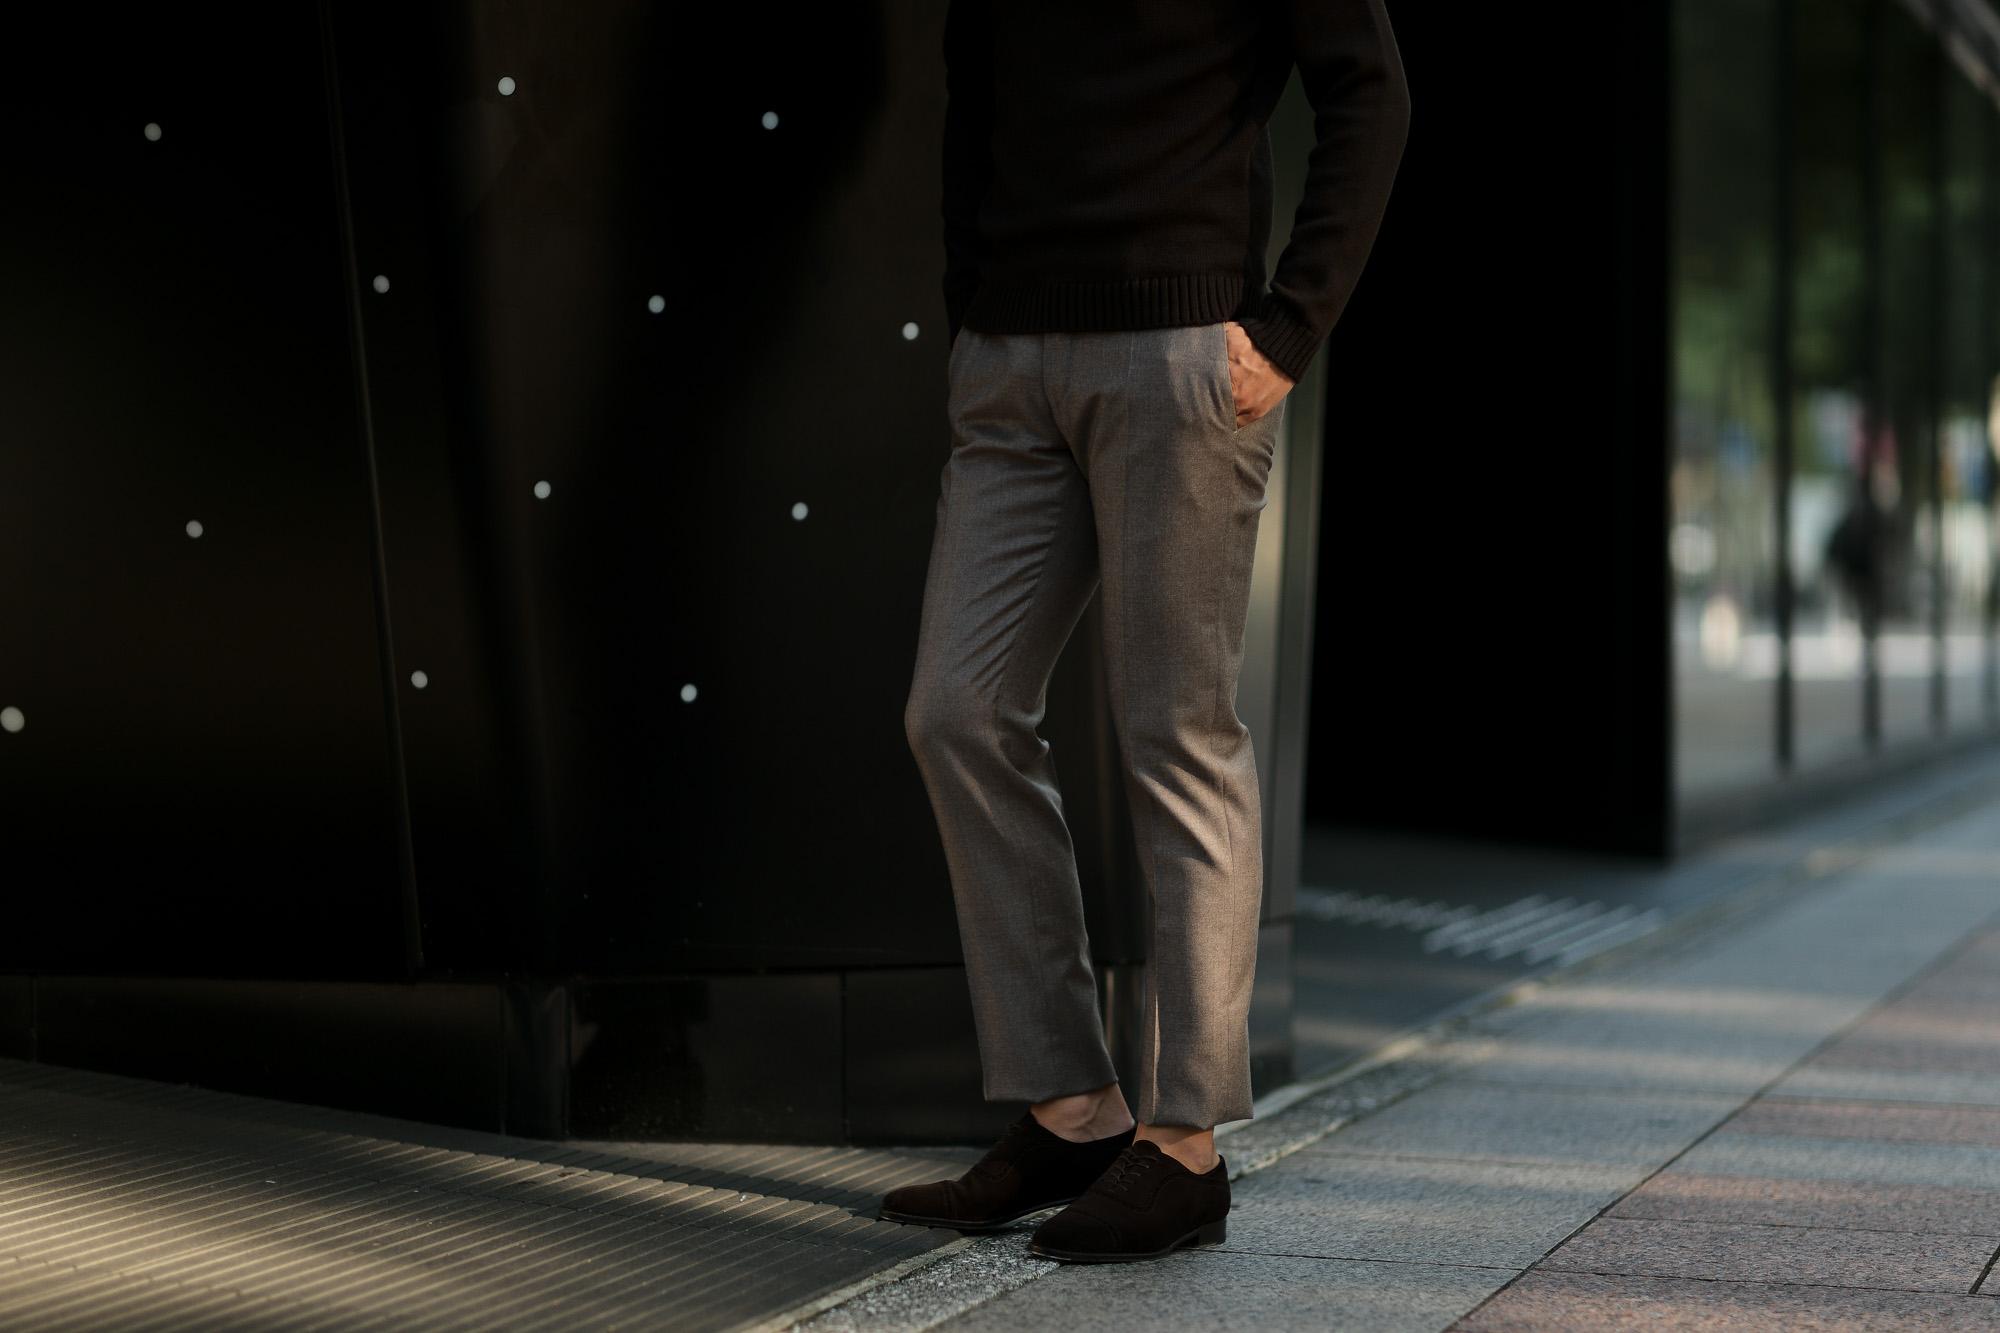 INCOTEX (インコテックス) N35 SLIM FIT (1NT035) SUPER 100'S WORSTED FLANNEL フランネル ウール スラックス BEIGE (ベージュ・420) 2019 秋冬新作 愛知 名古屋 altoediritto アルトエデリット